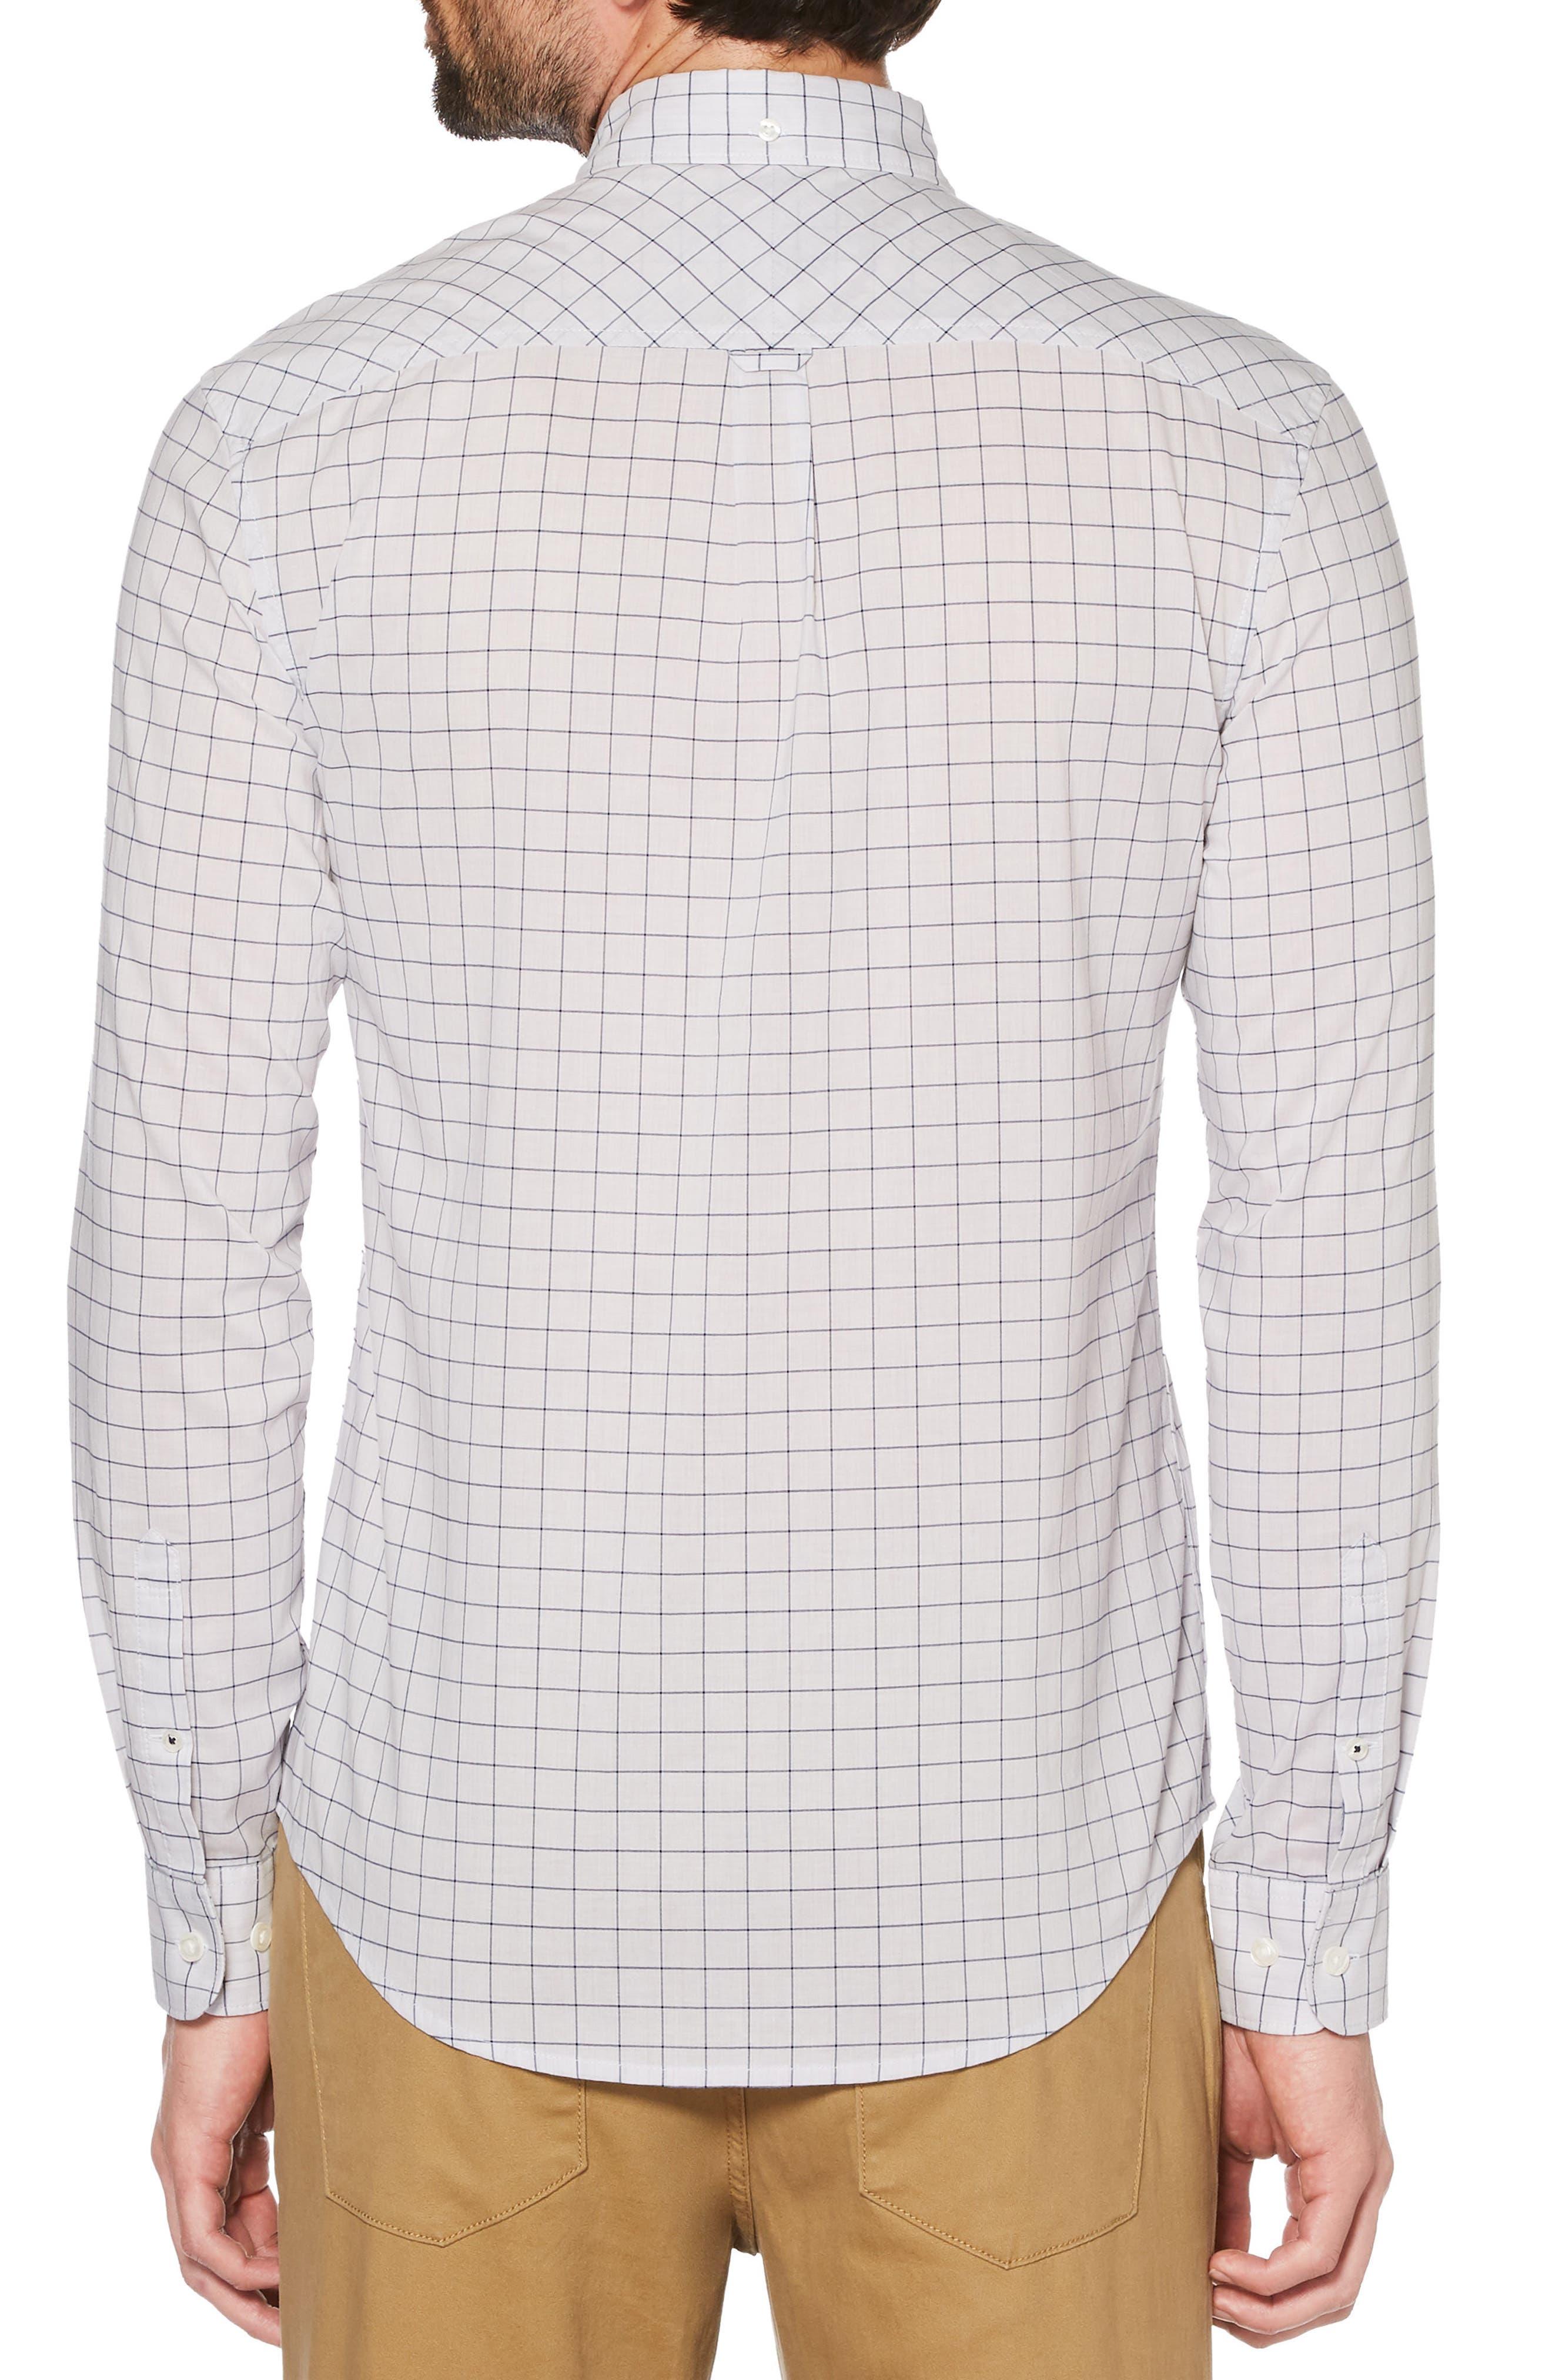 P55 Slim Fit Shirt,                             Alternate thumbnail 2, color,                             427